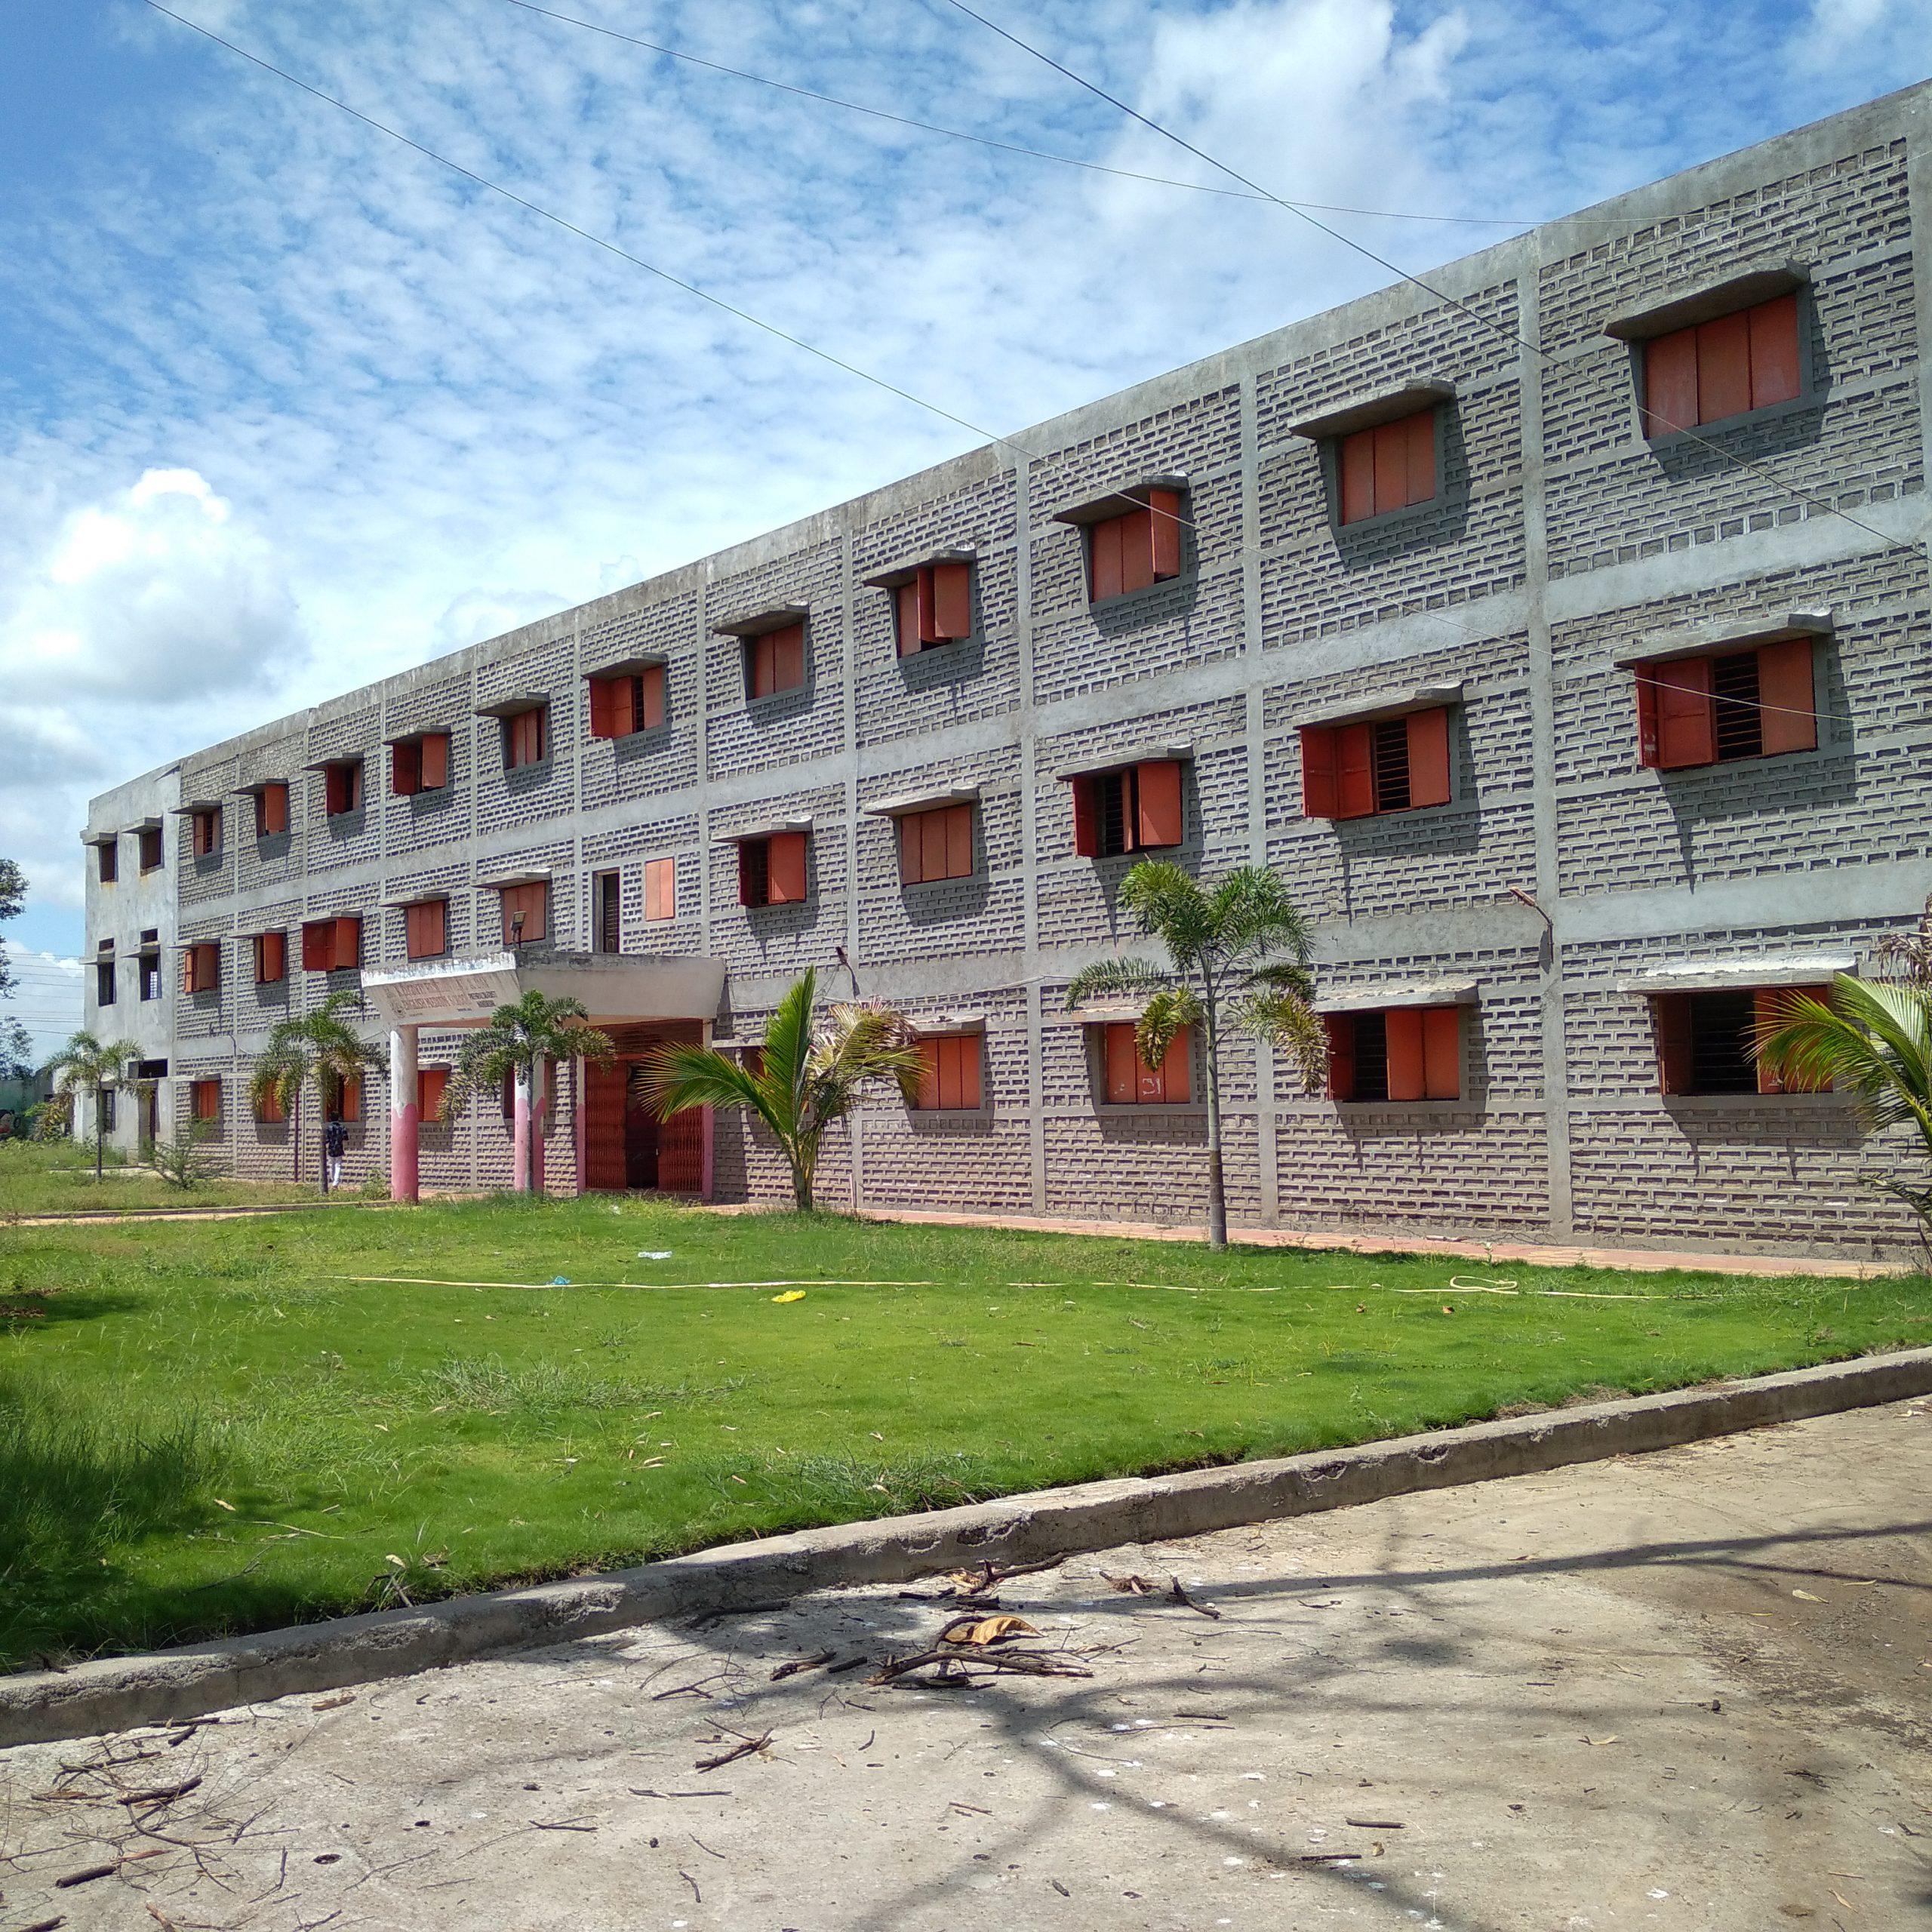 A hostel building